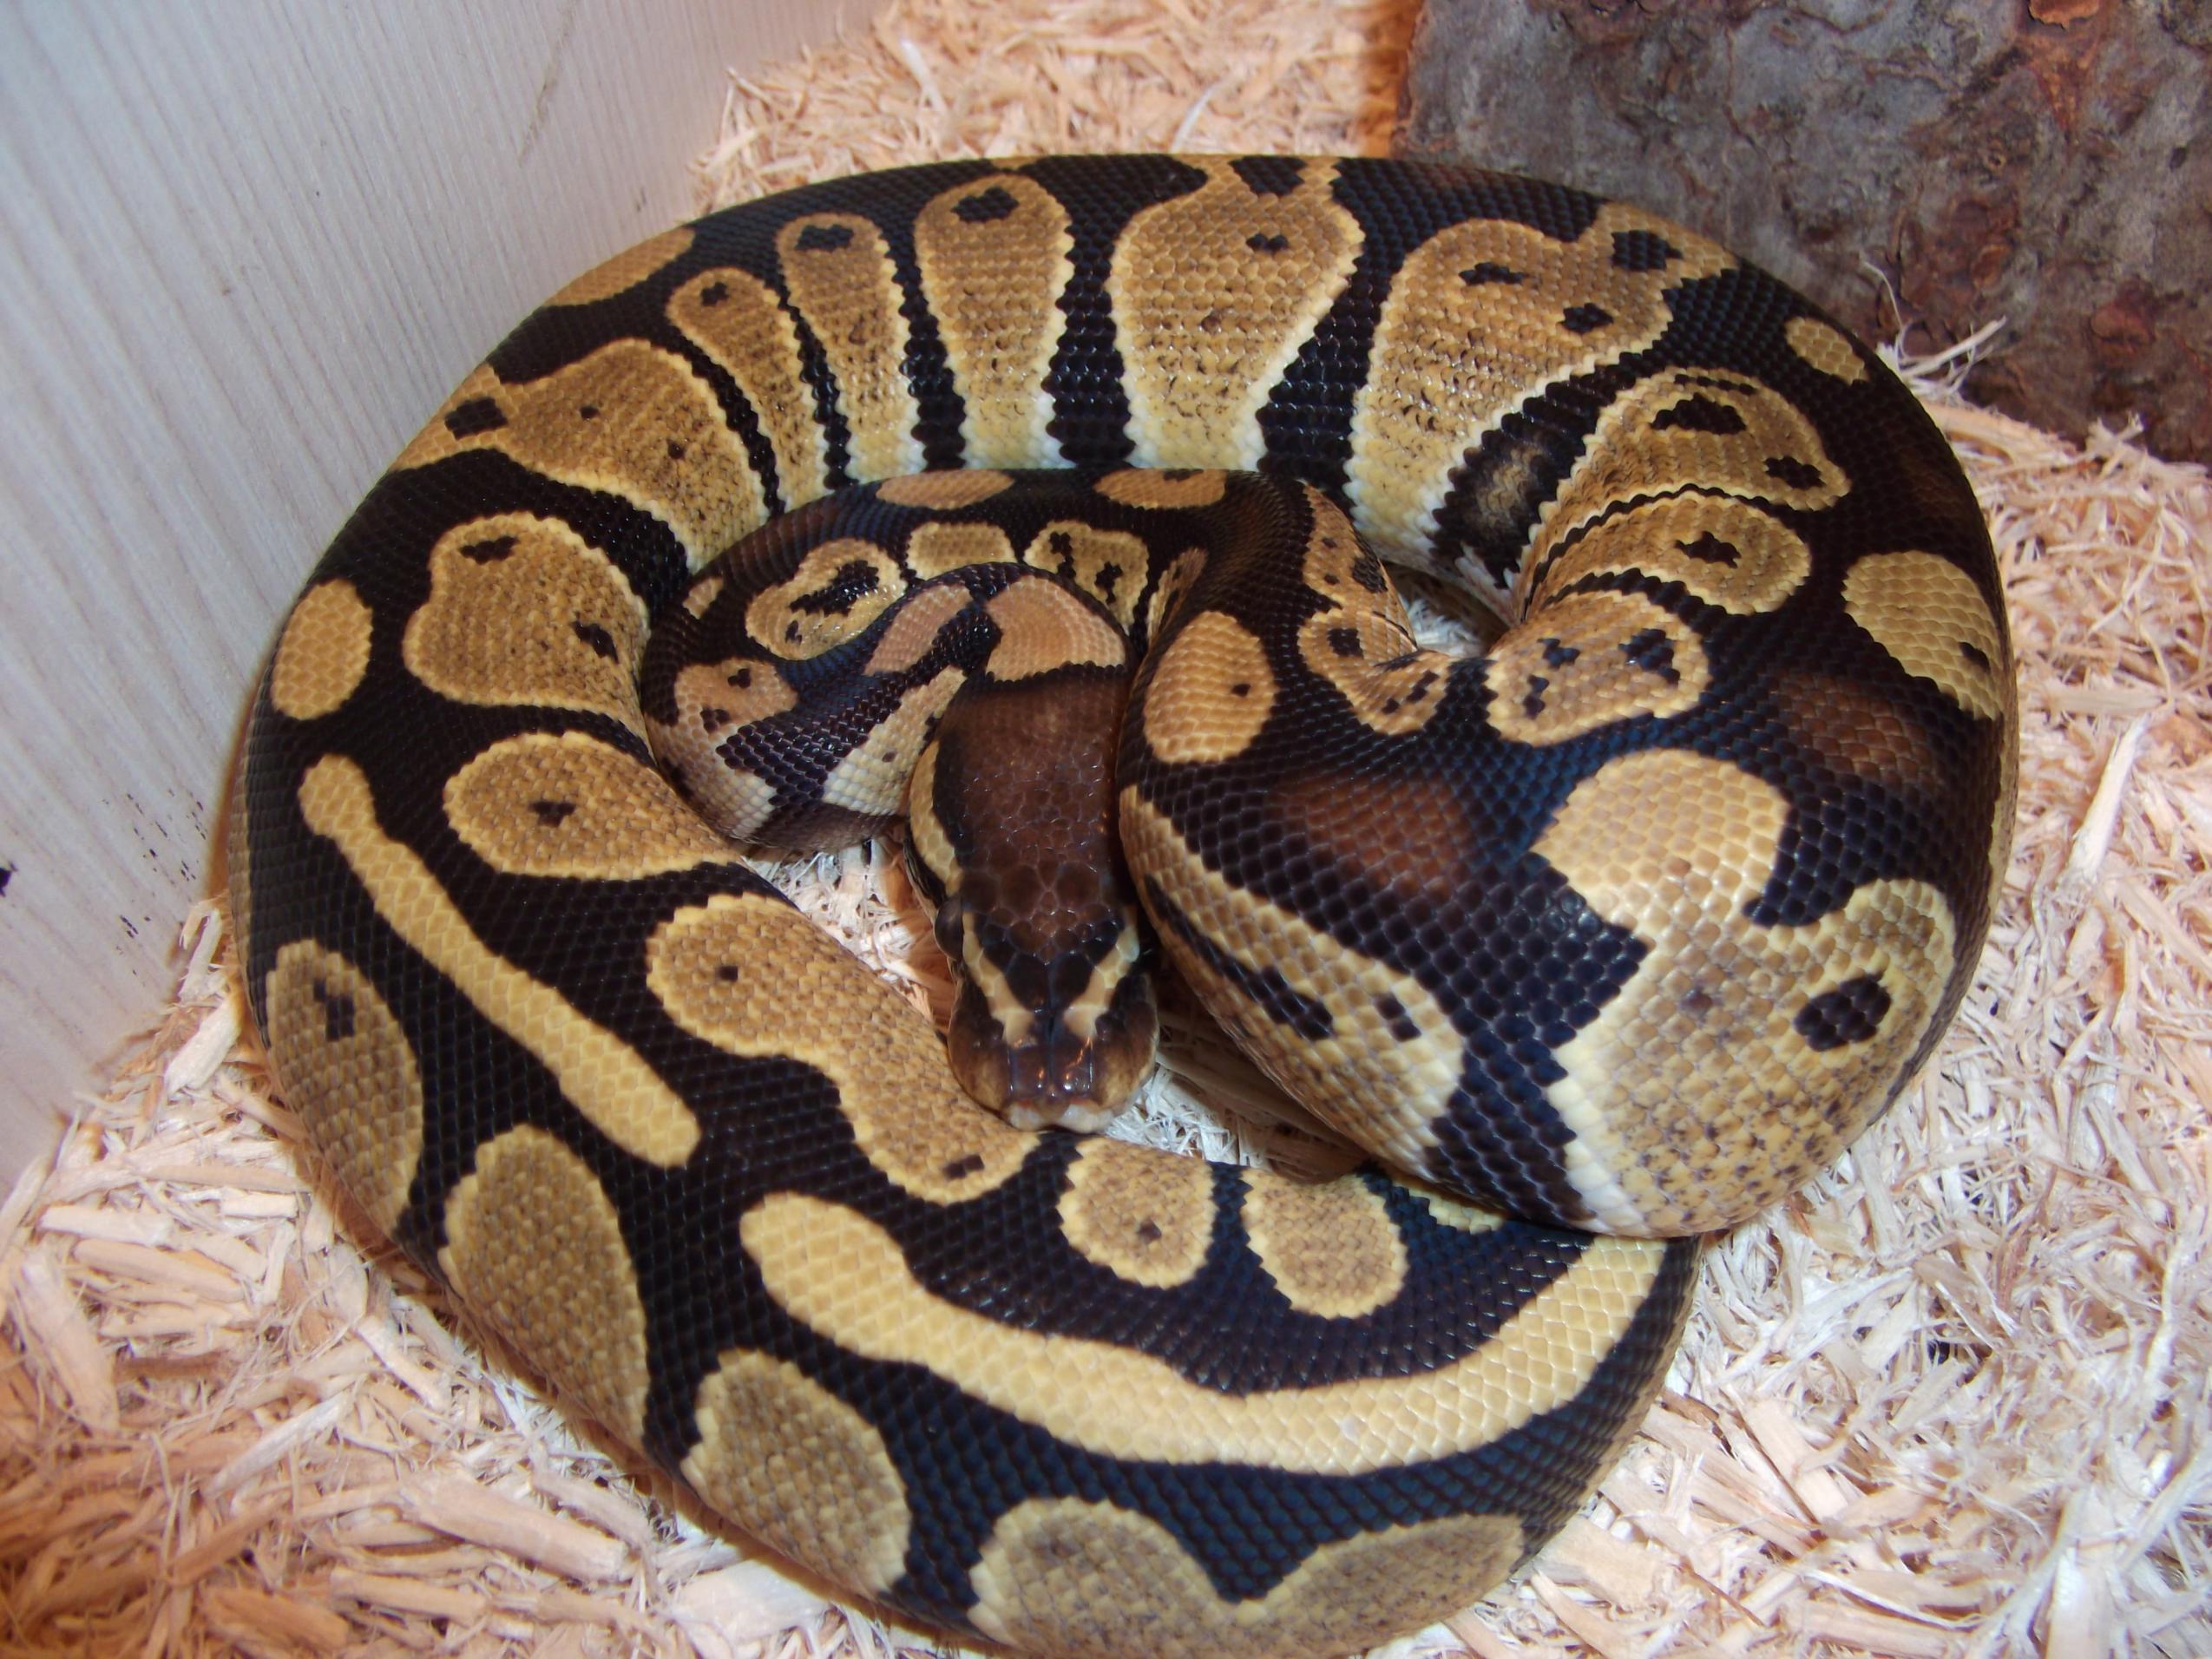 female royal python and male royal python-dscf0132.jpg